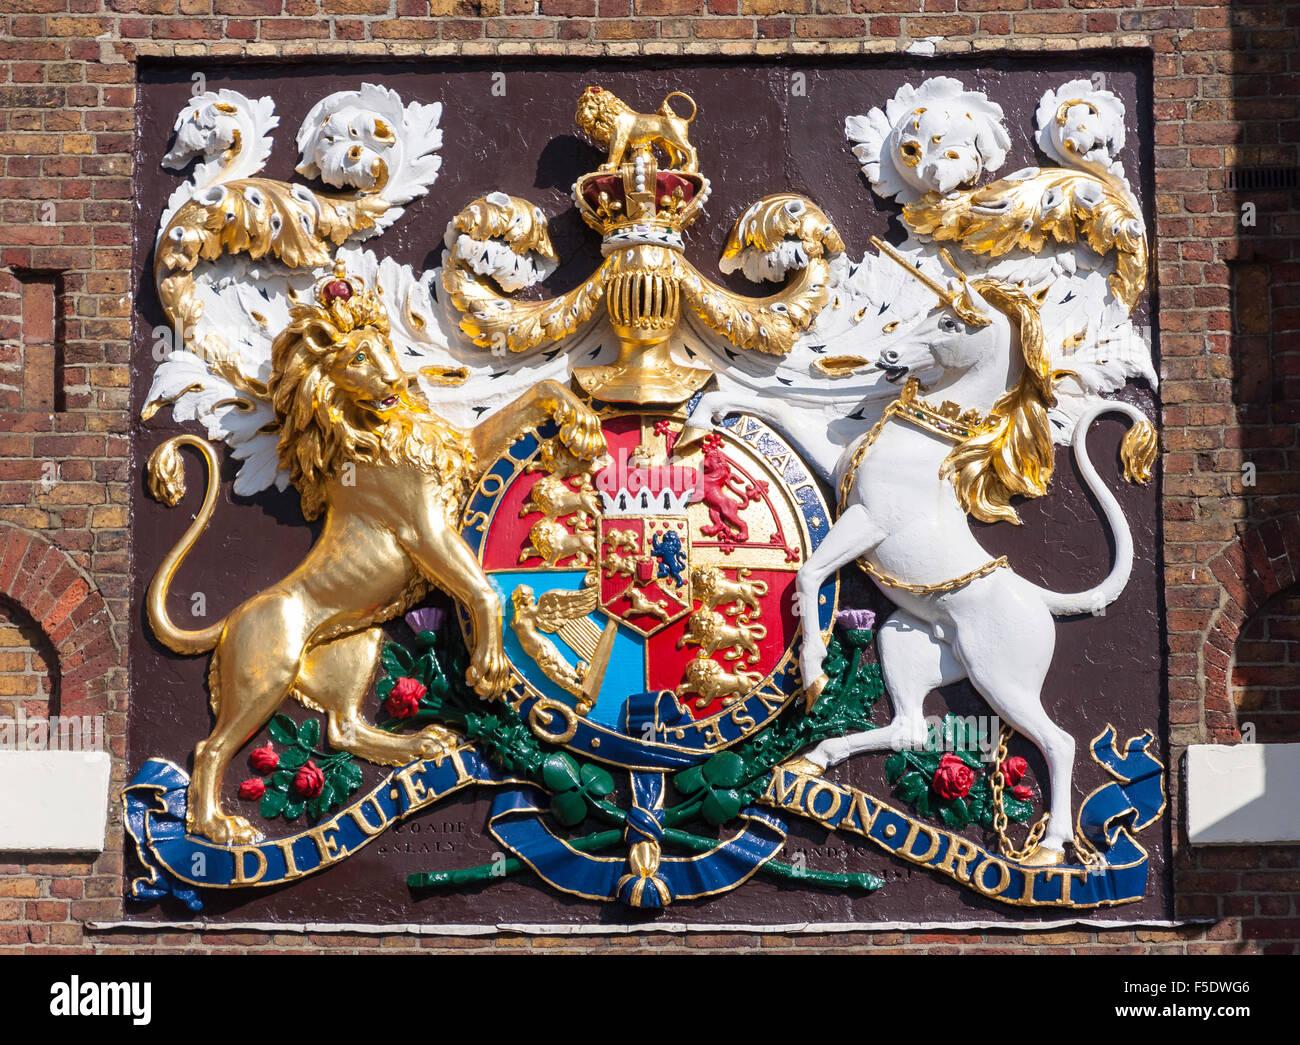 Royal Coat of Arms at entrance gate to Chatham Historic Dockyard, Chatham, Kent, England, United Kingdom - Stock Image